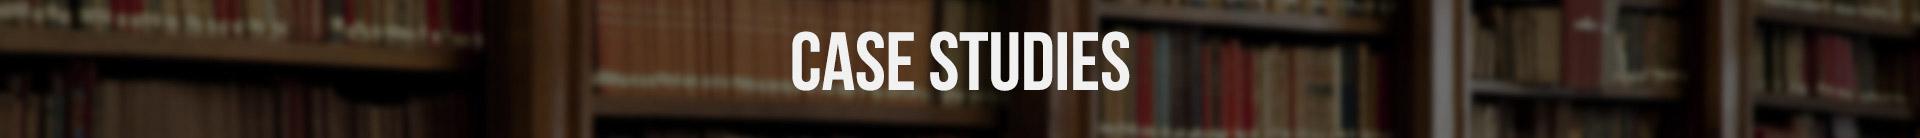 CaseStudies-Banner